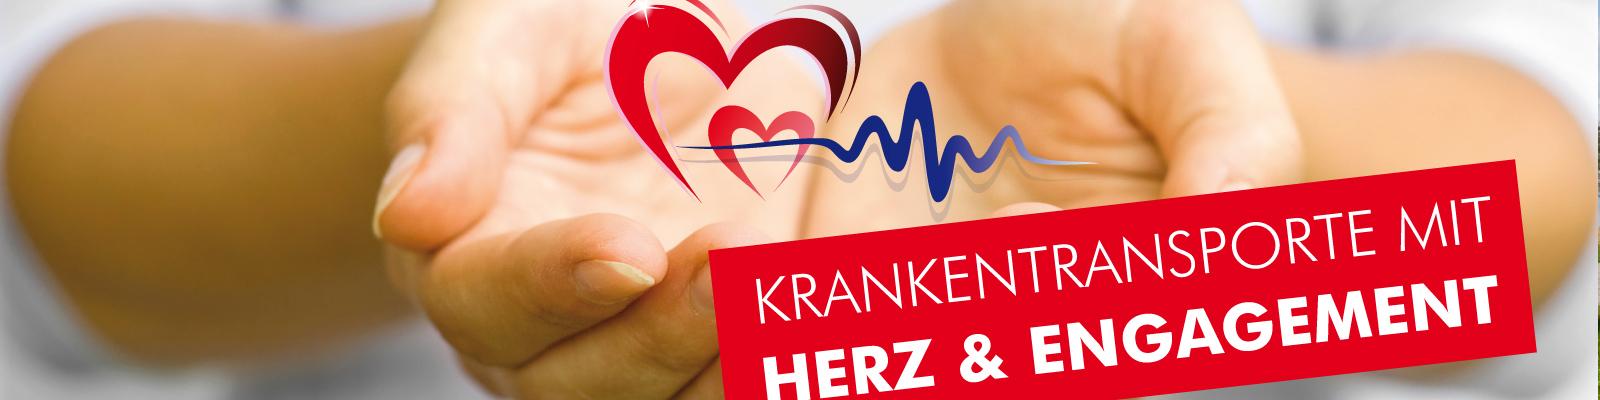 Krankentransport Sabine Ecker- Bezirk Rohrbach